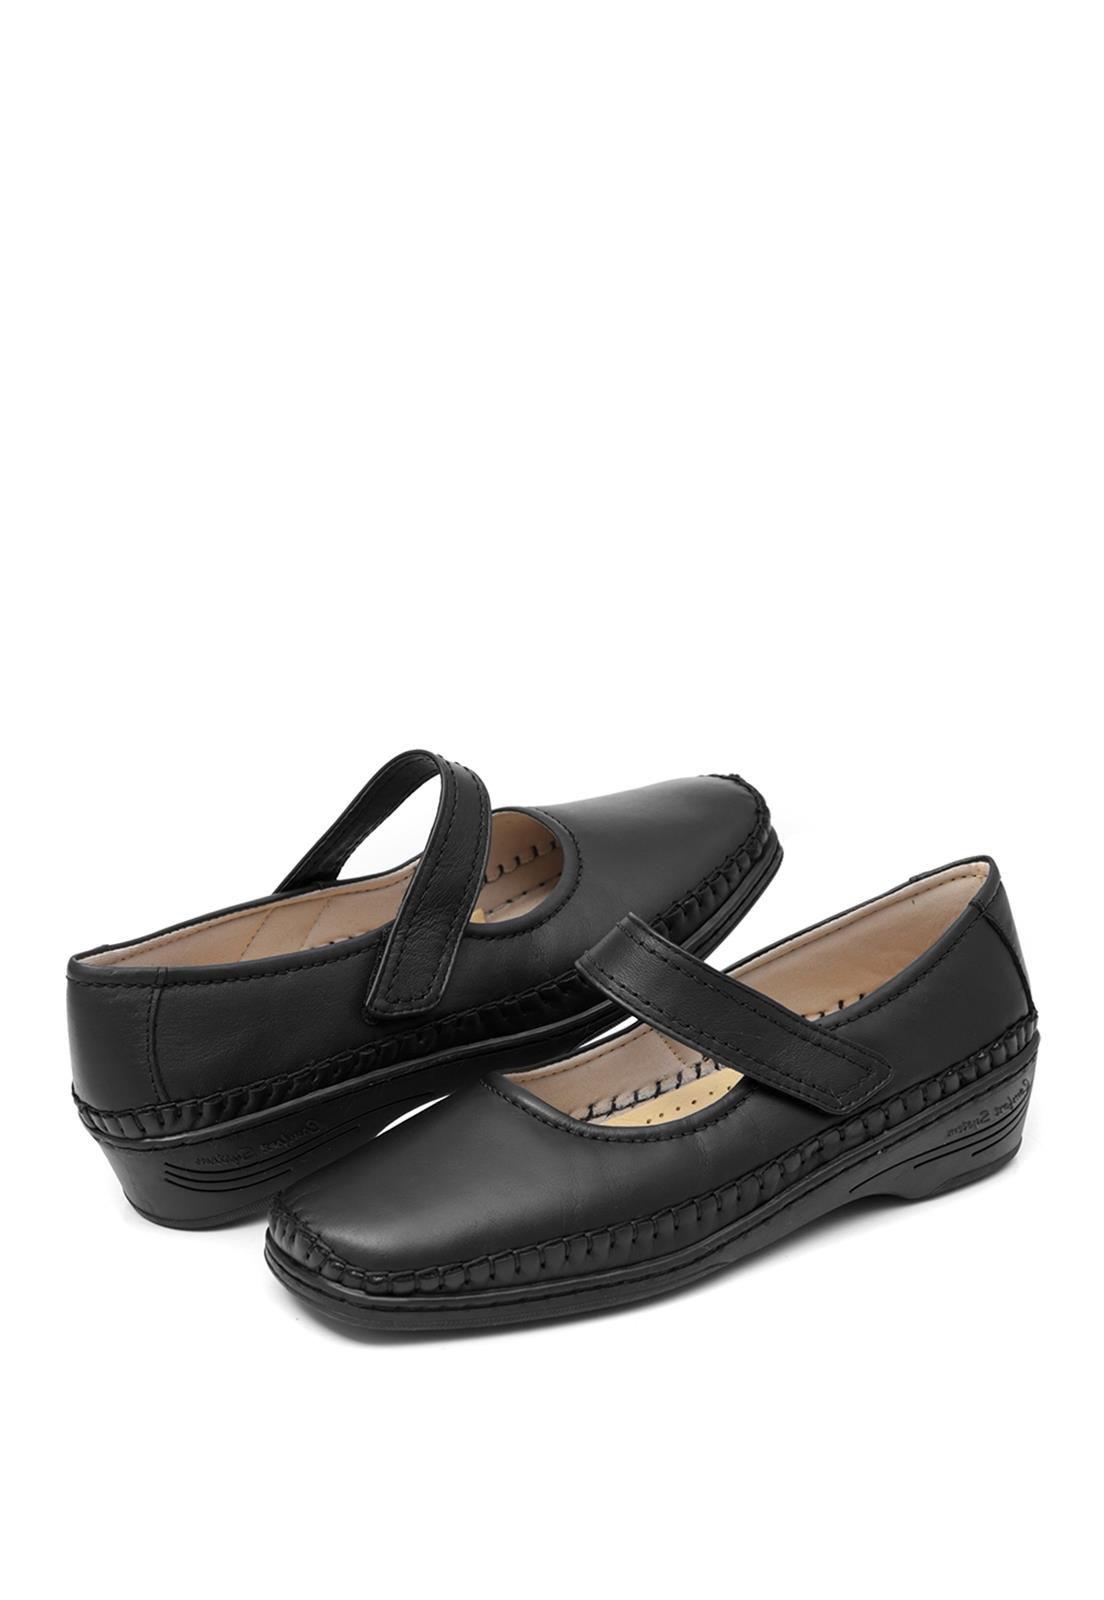 Sapato Conforto MagerShoes 1016 - Cores